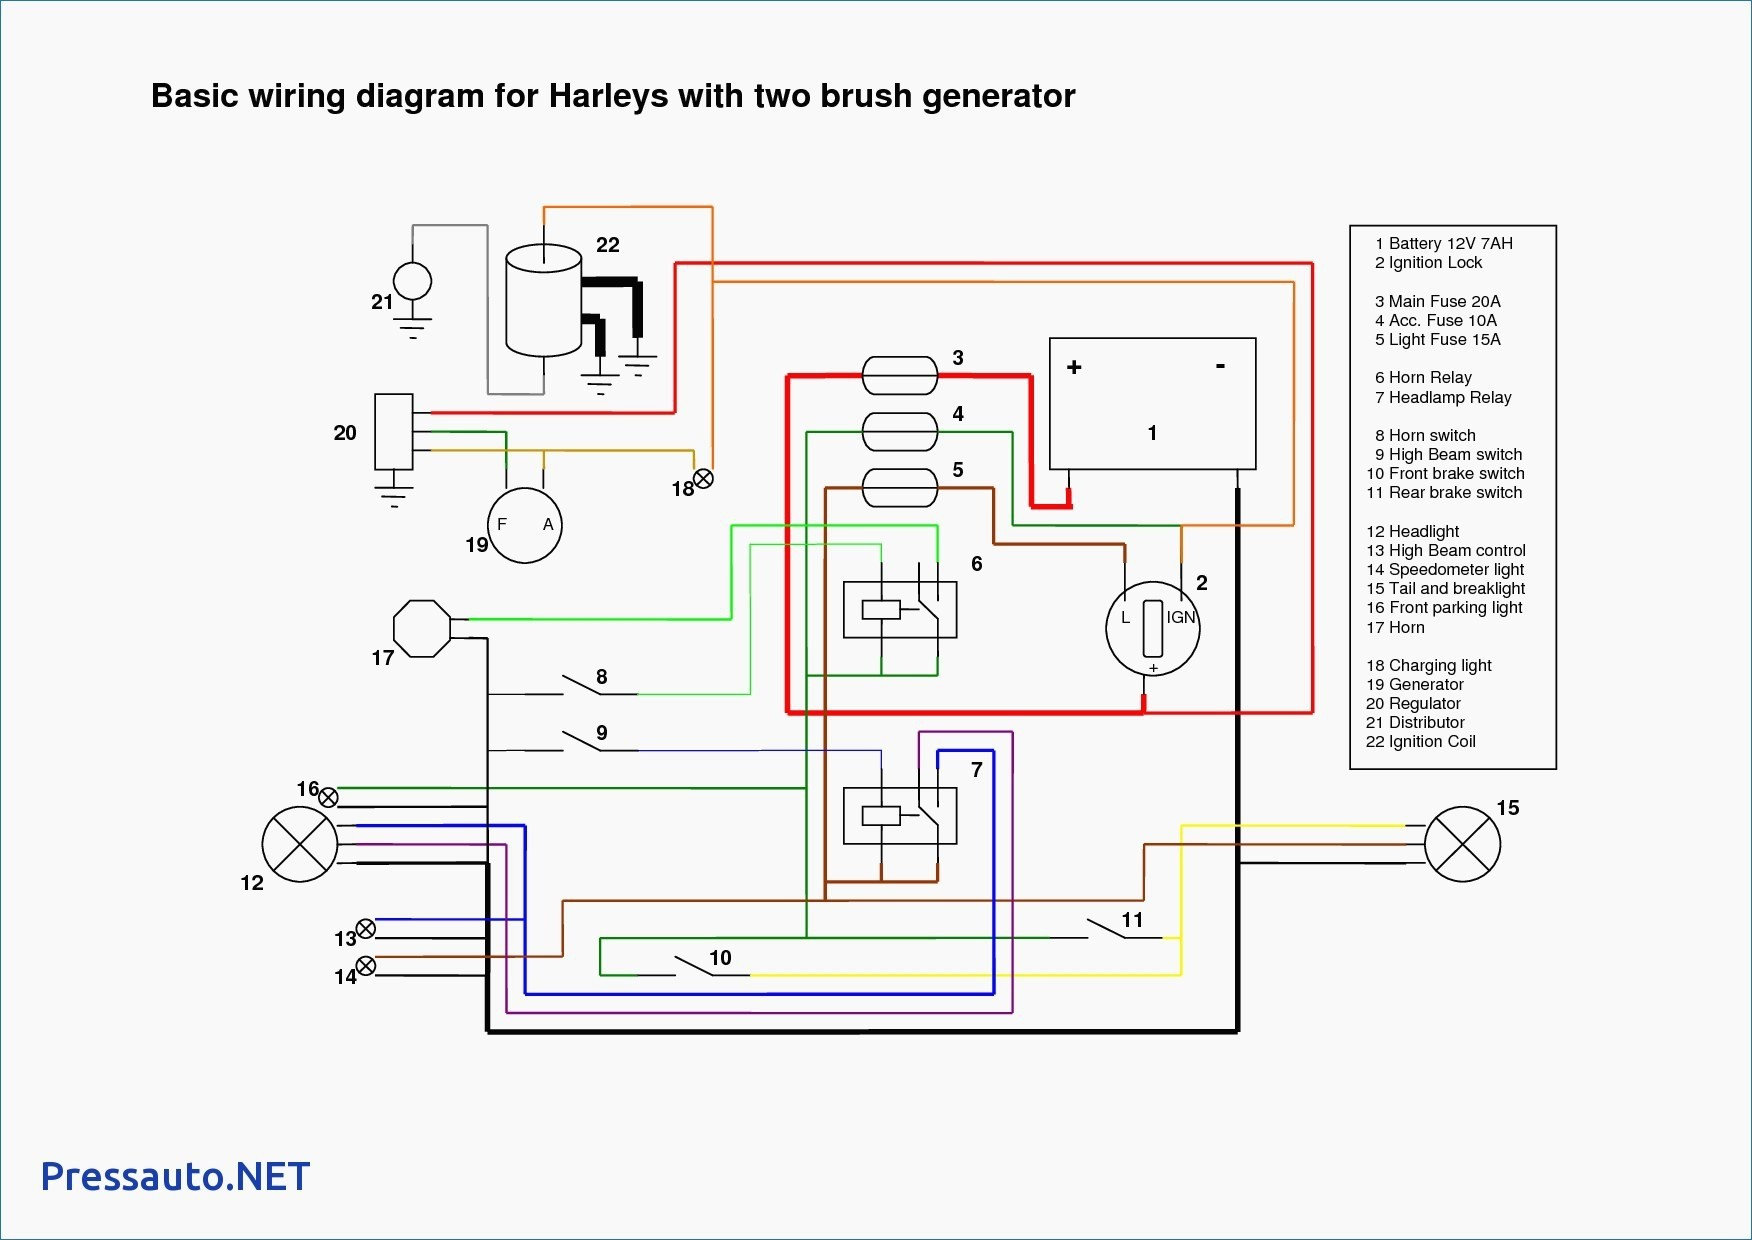 Basic Ignition Wiring Diagram Unique Coil Wiring Diagram Diagram Of Basic Ignition Wiring Diagram